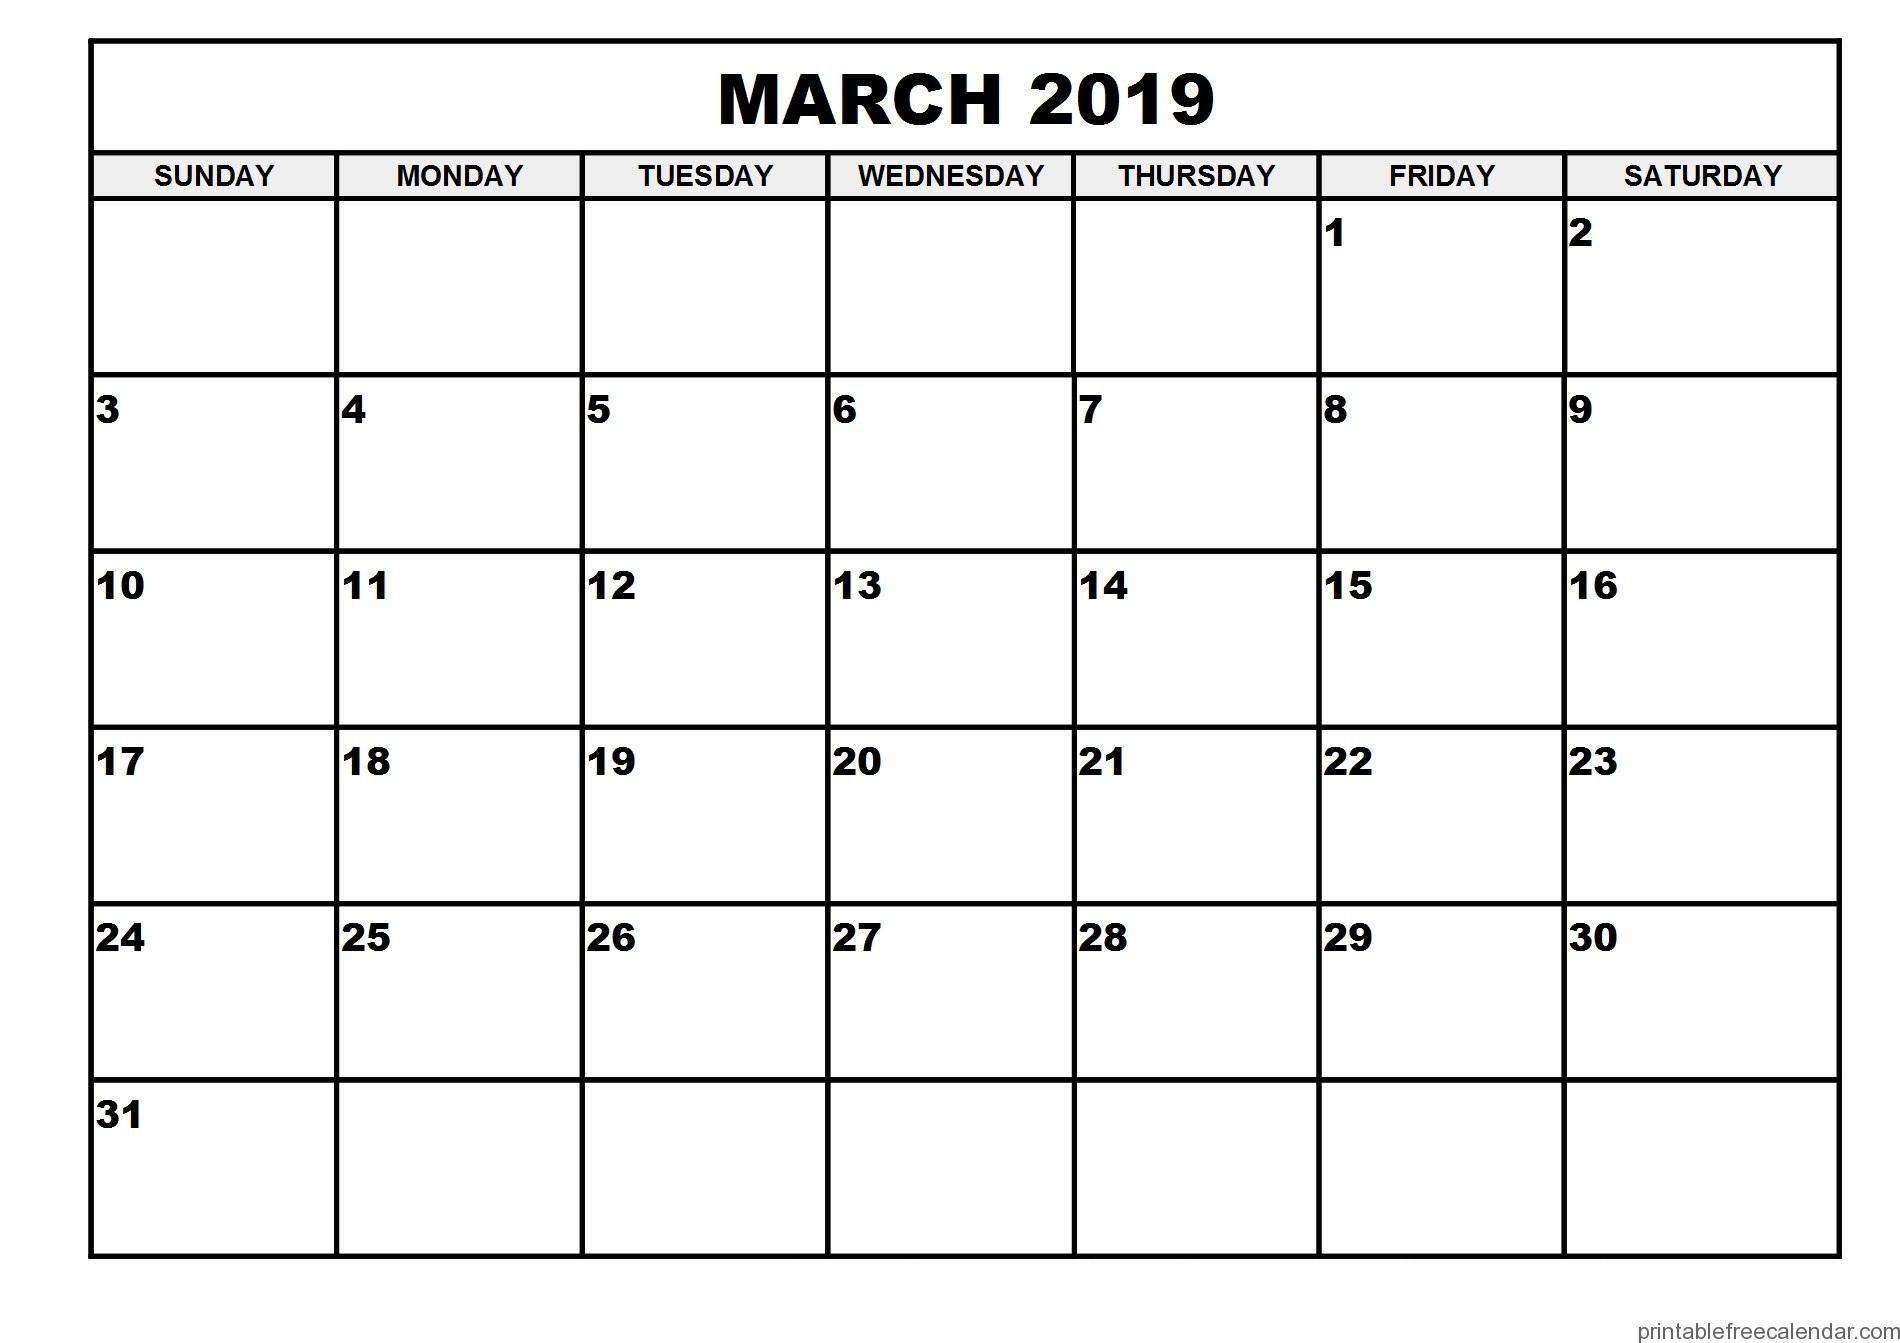 March Calendar Print Out Más Actual Printable Free Calendar Template Lara Expolicenciaslatam Of March Calendar Print Out Recientes Monthly Calendar 2015 Template Printable 2016 Calendar Templates